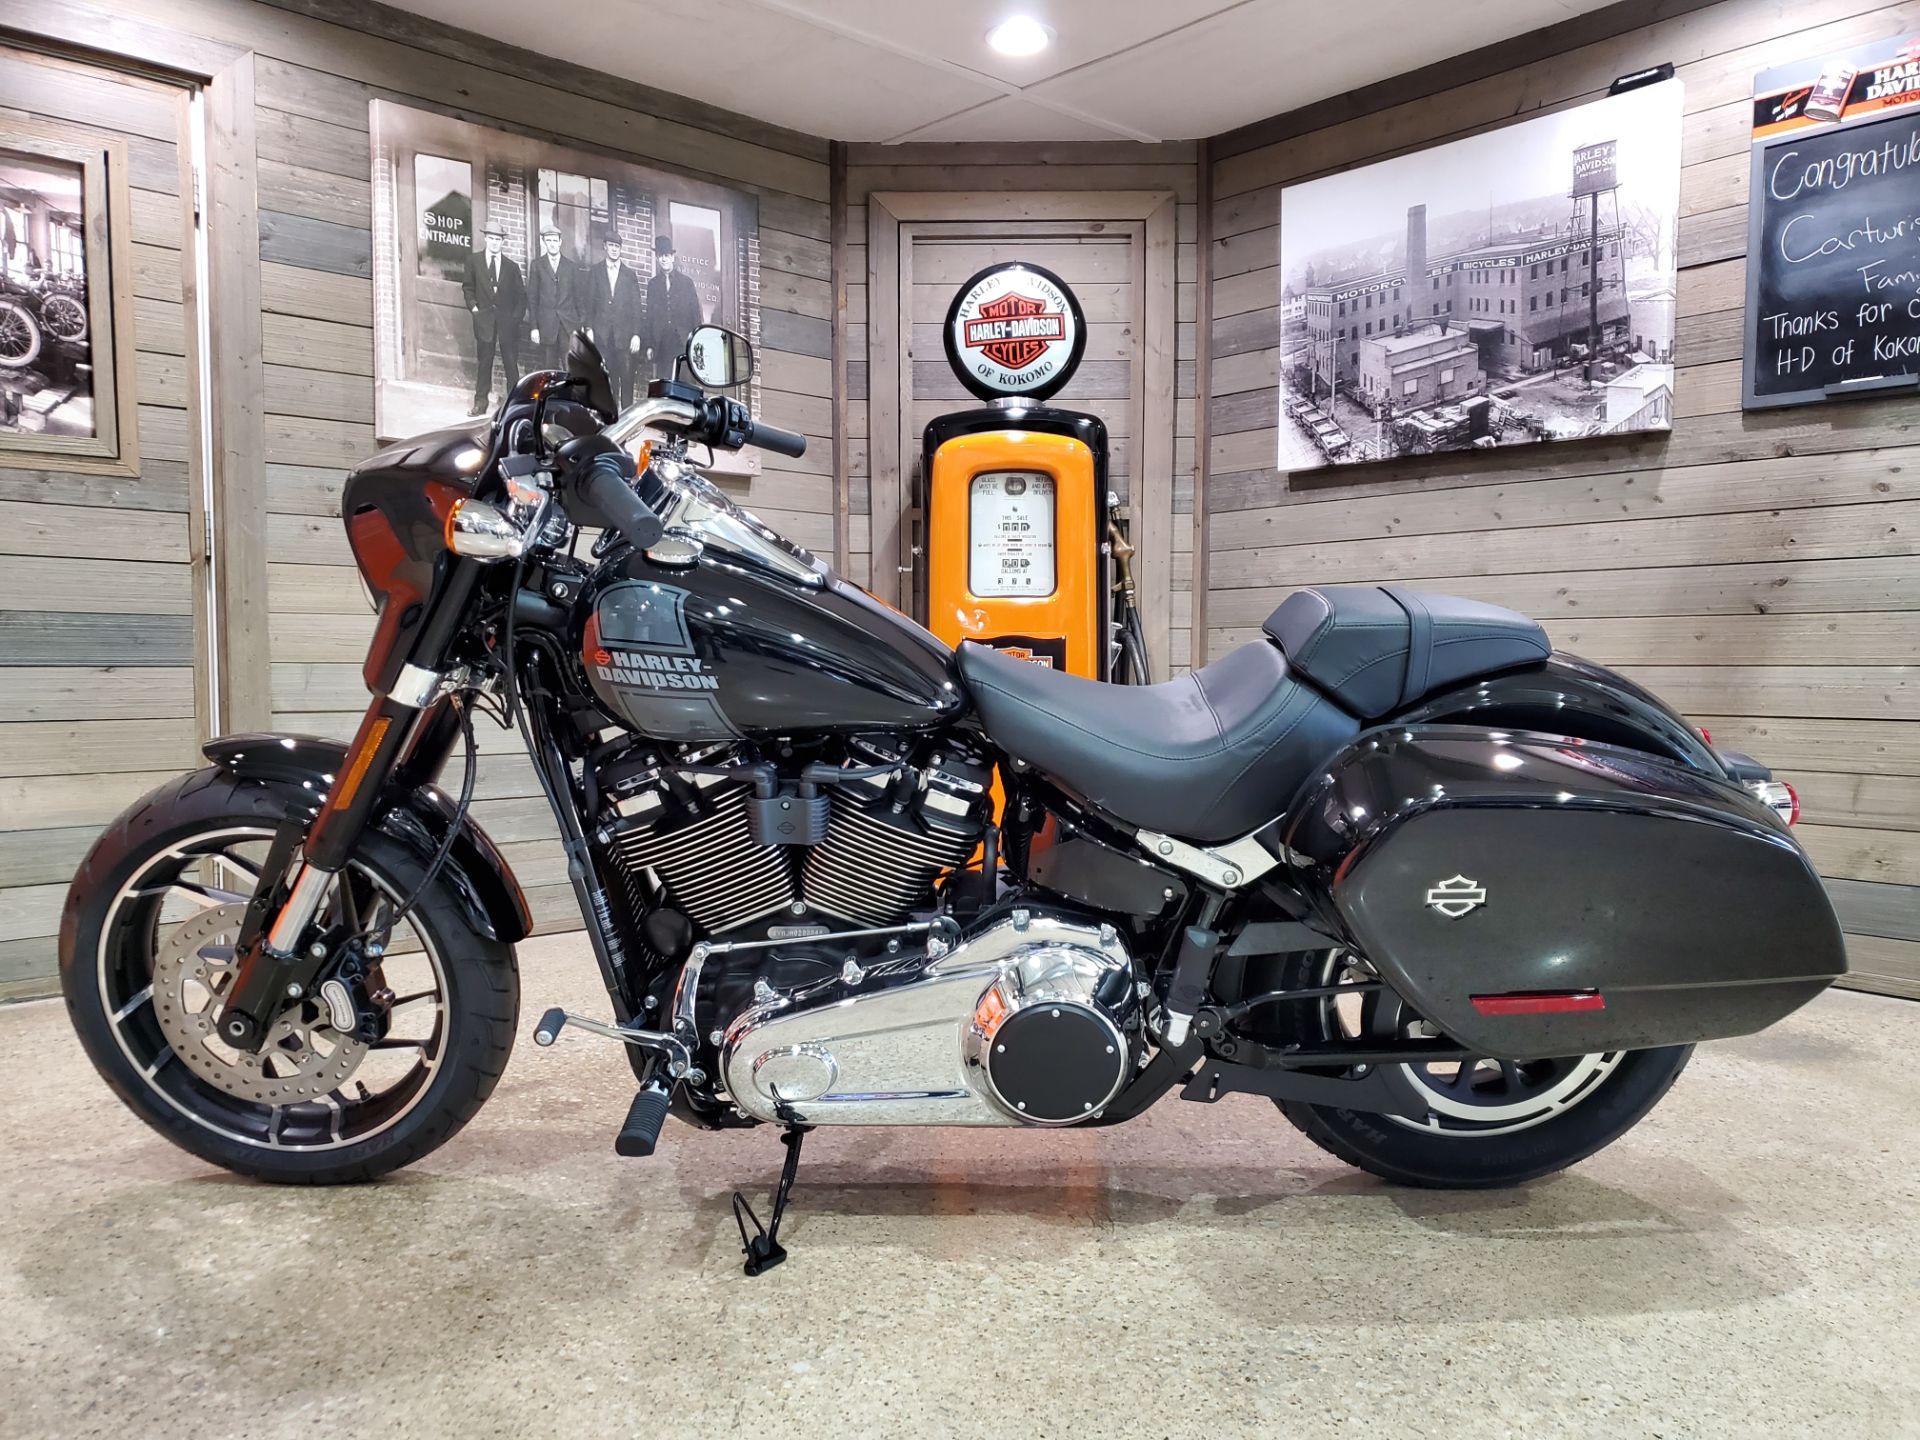 2019 Sport Glide Motorcycle   Harley-Davidson Australia